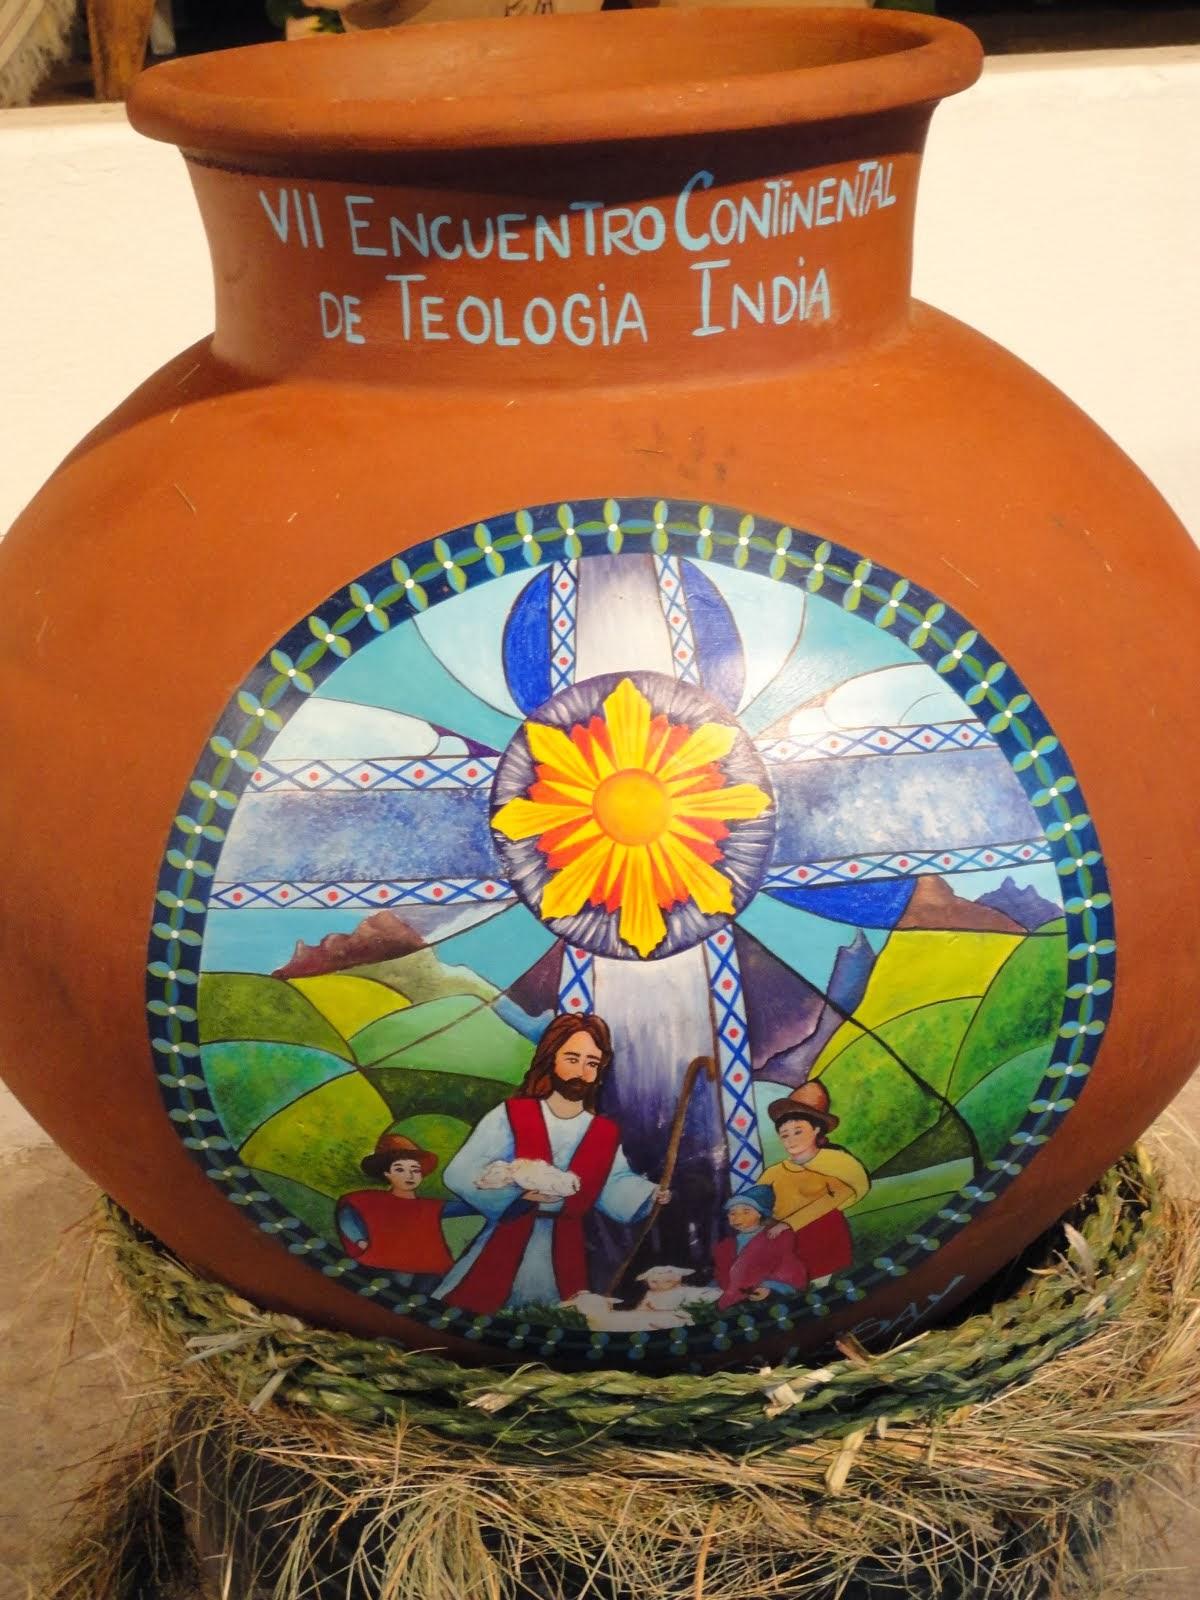 VII Encontro Continental de Teologia Índia